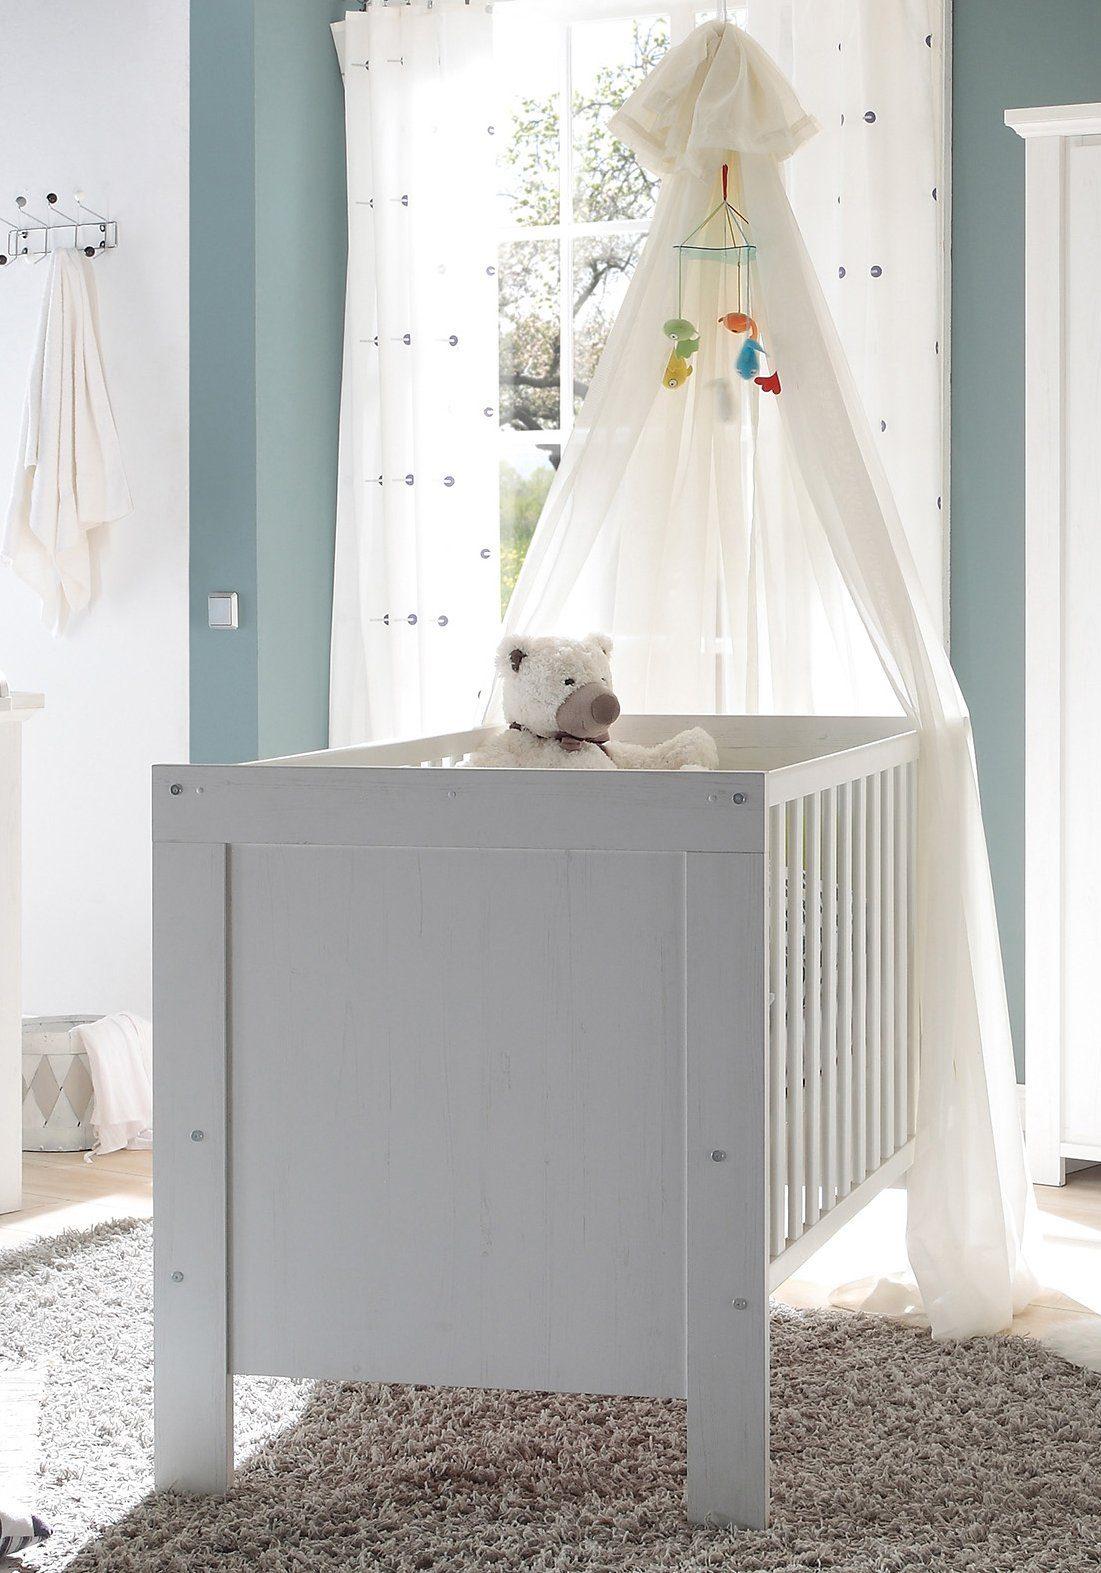 Babybett zur Babymöbel Serie »Dandy«, in anderson pine